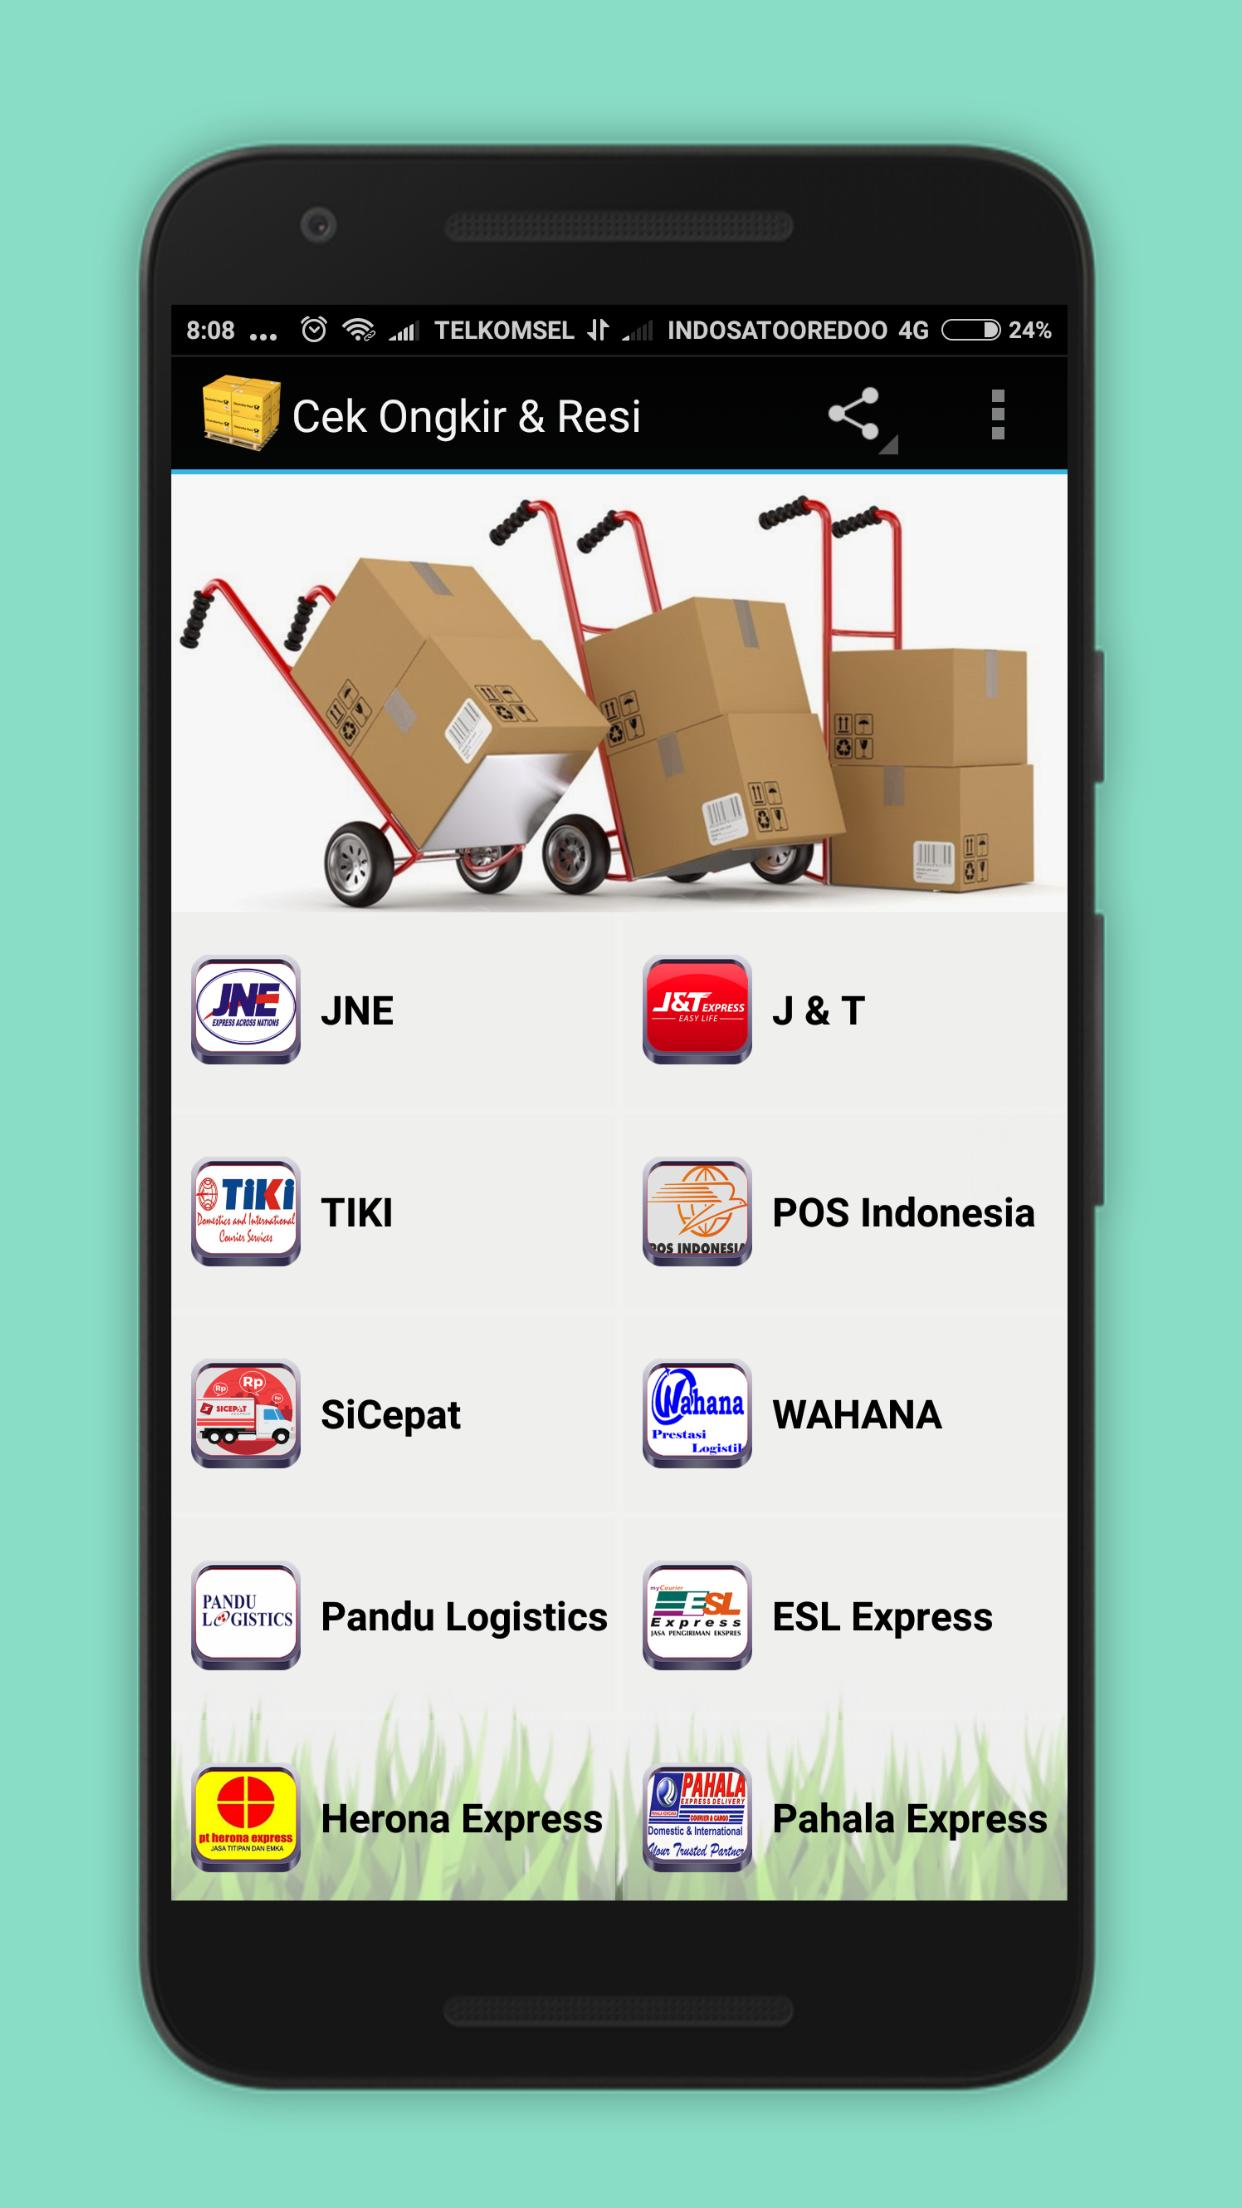 Cek Paket & Ongkir for Android - APK Download